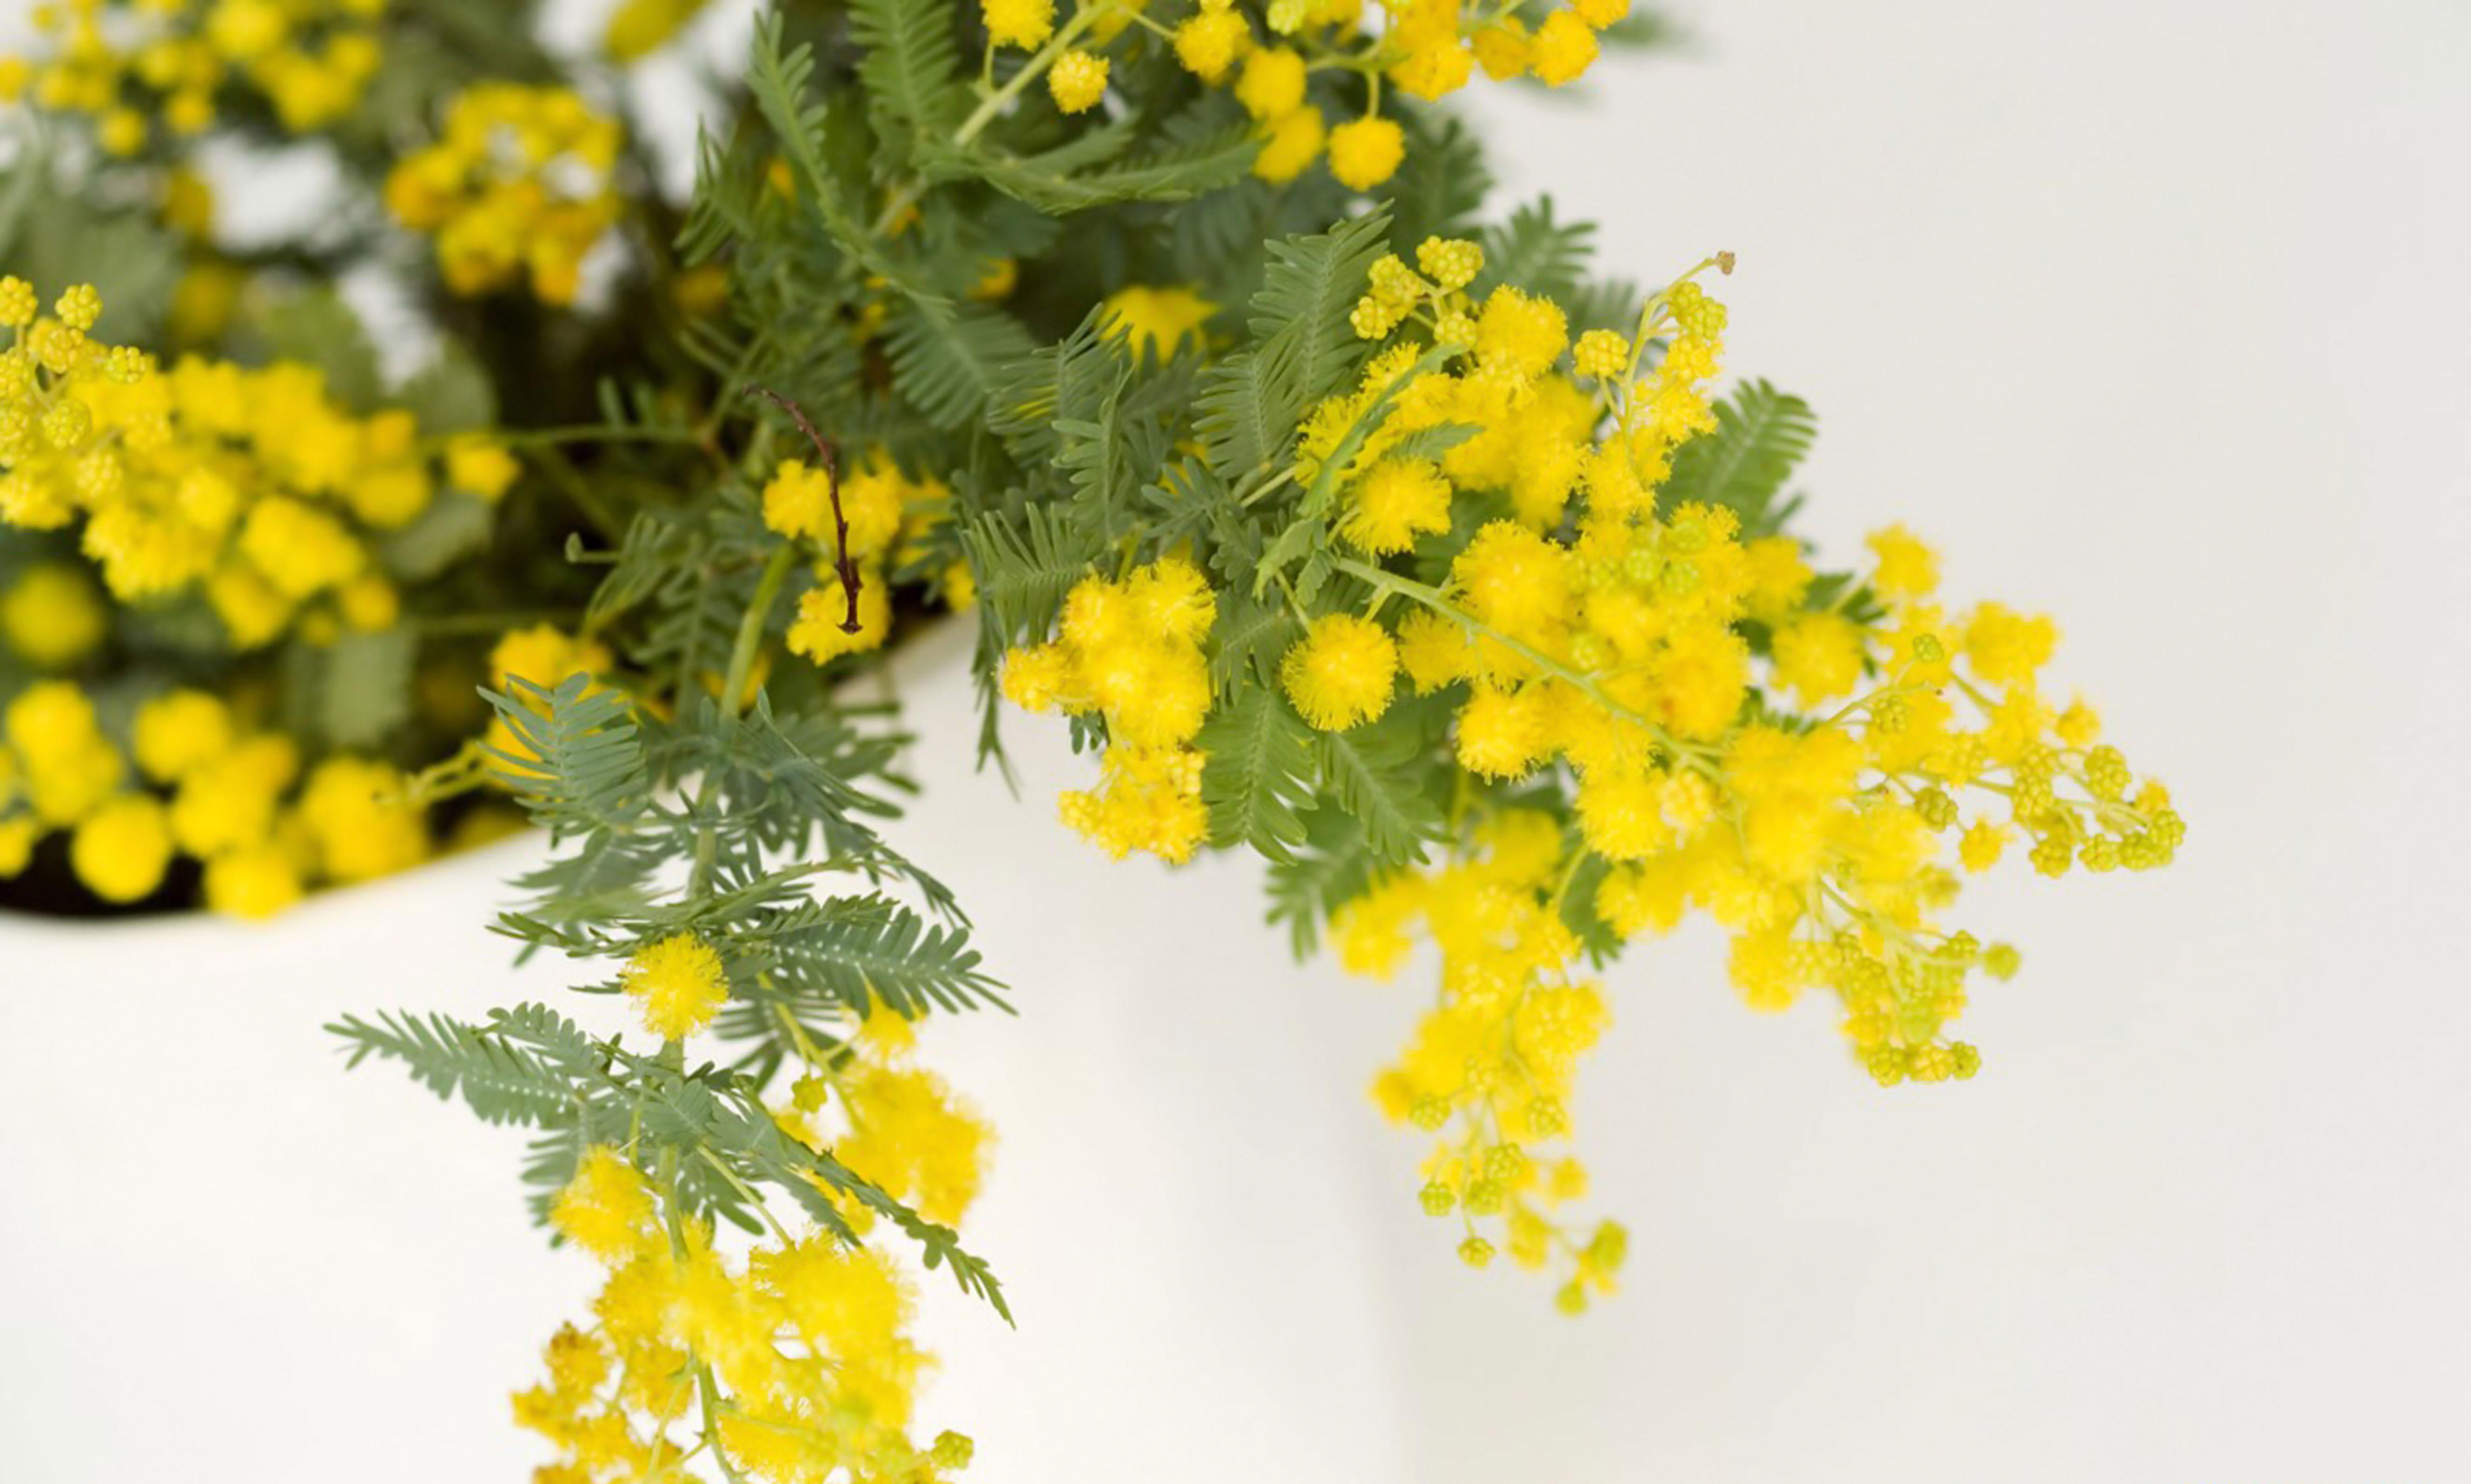 http://cp14.nevsepic.com.ua/183/18286/1384988615-mimoza-14.jpg